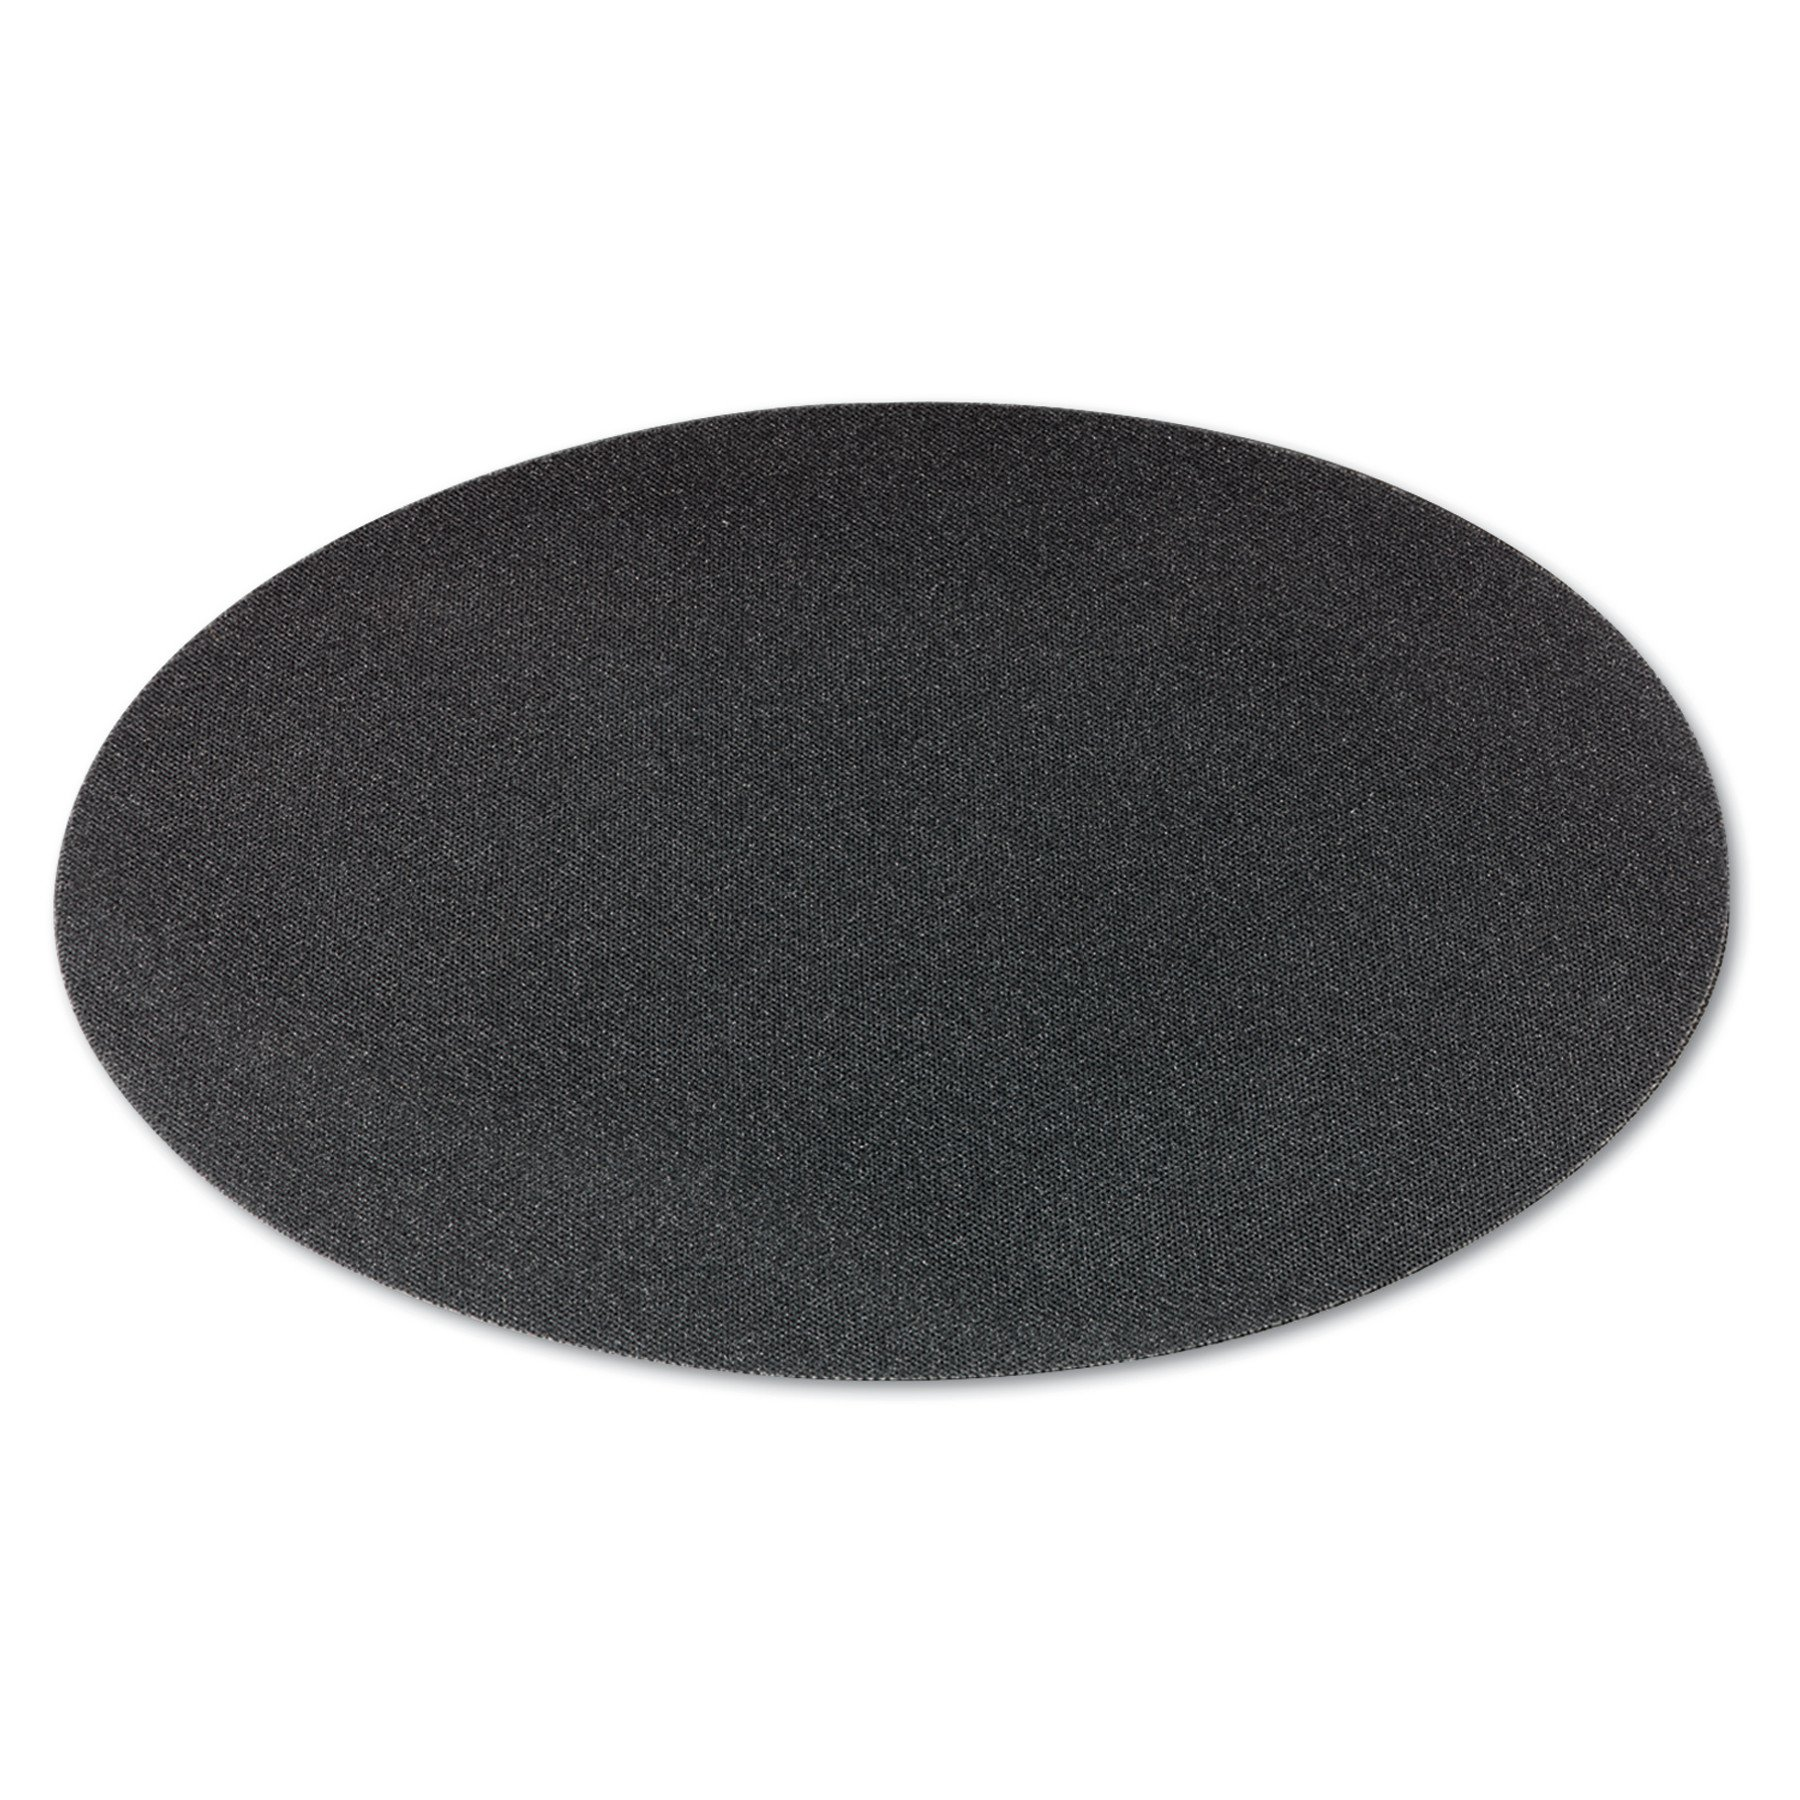 Boardwalk BWK50208010 Sanding Screens, 20'' Diameter, 80 Grit, Black (Case of 10)